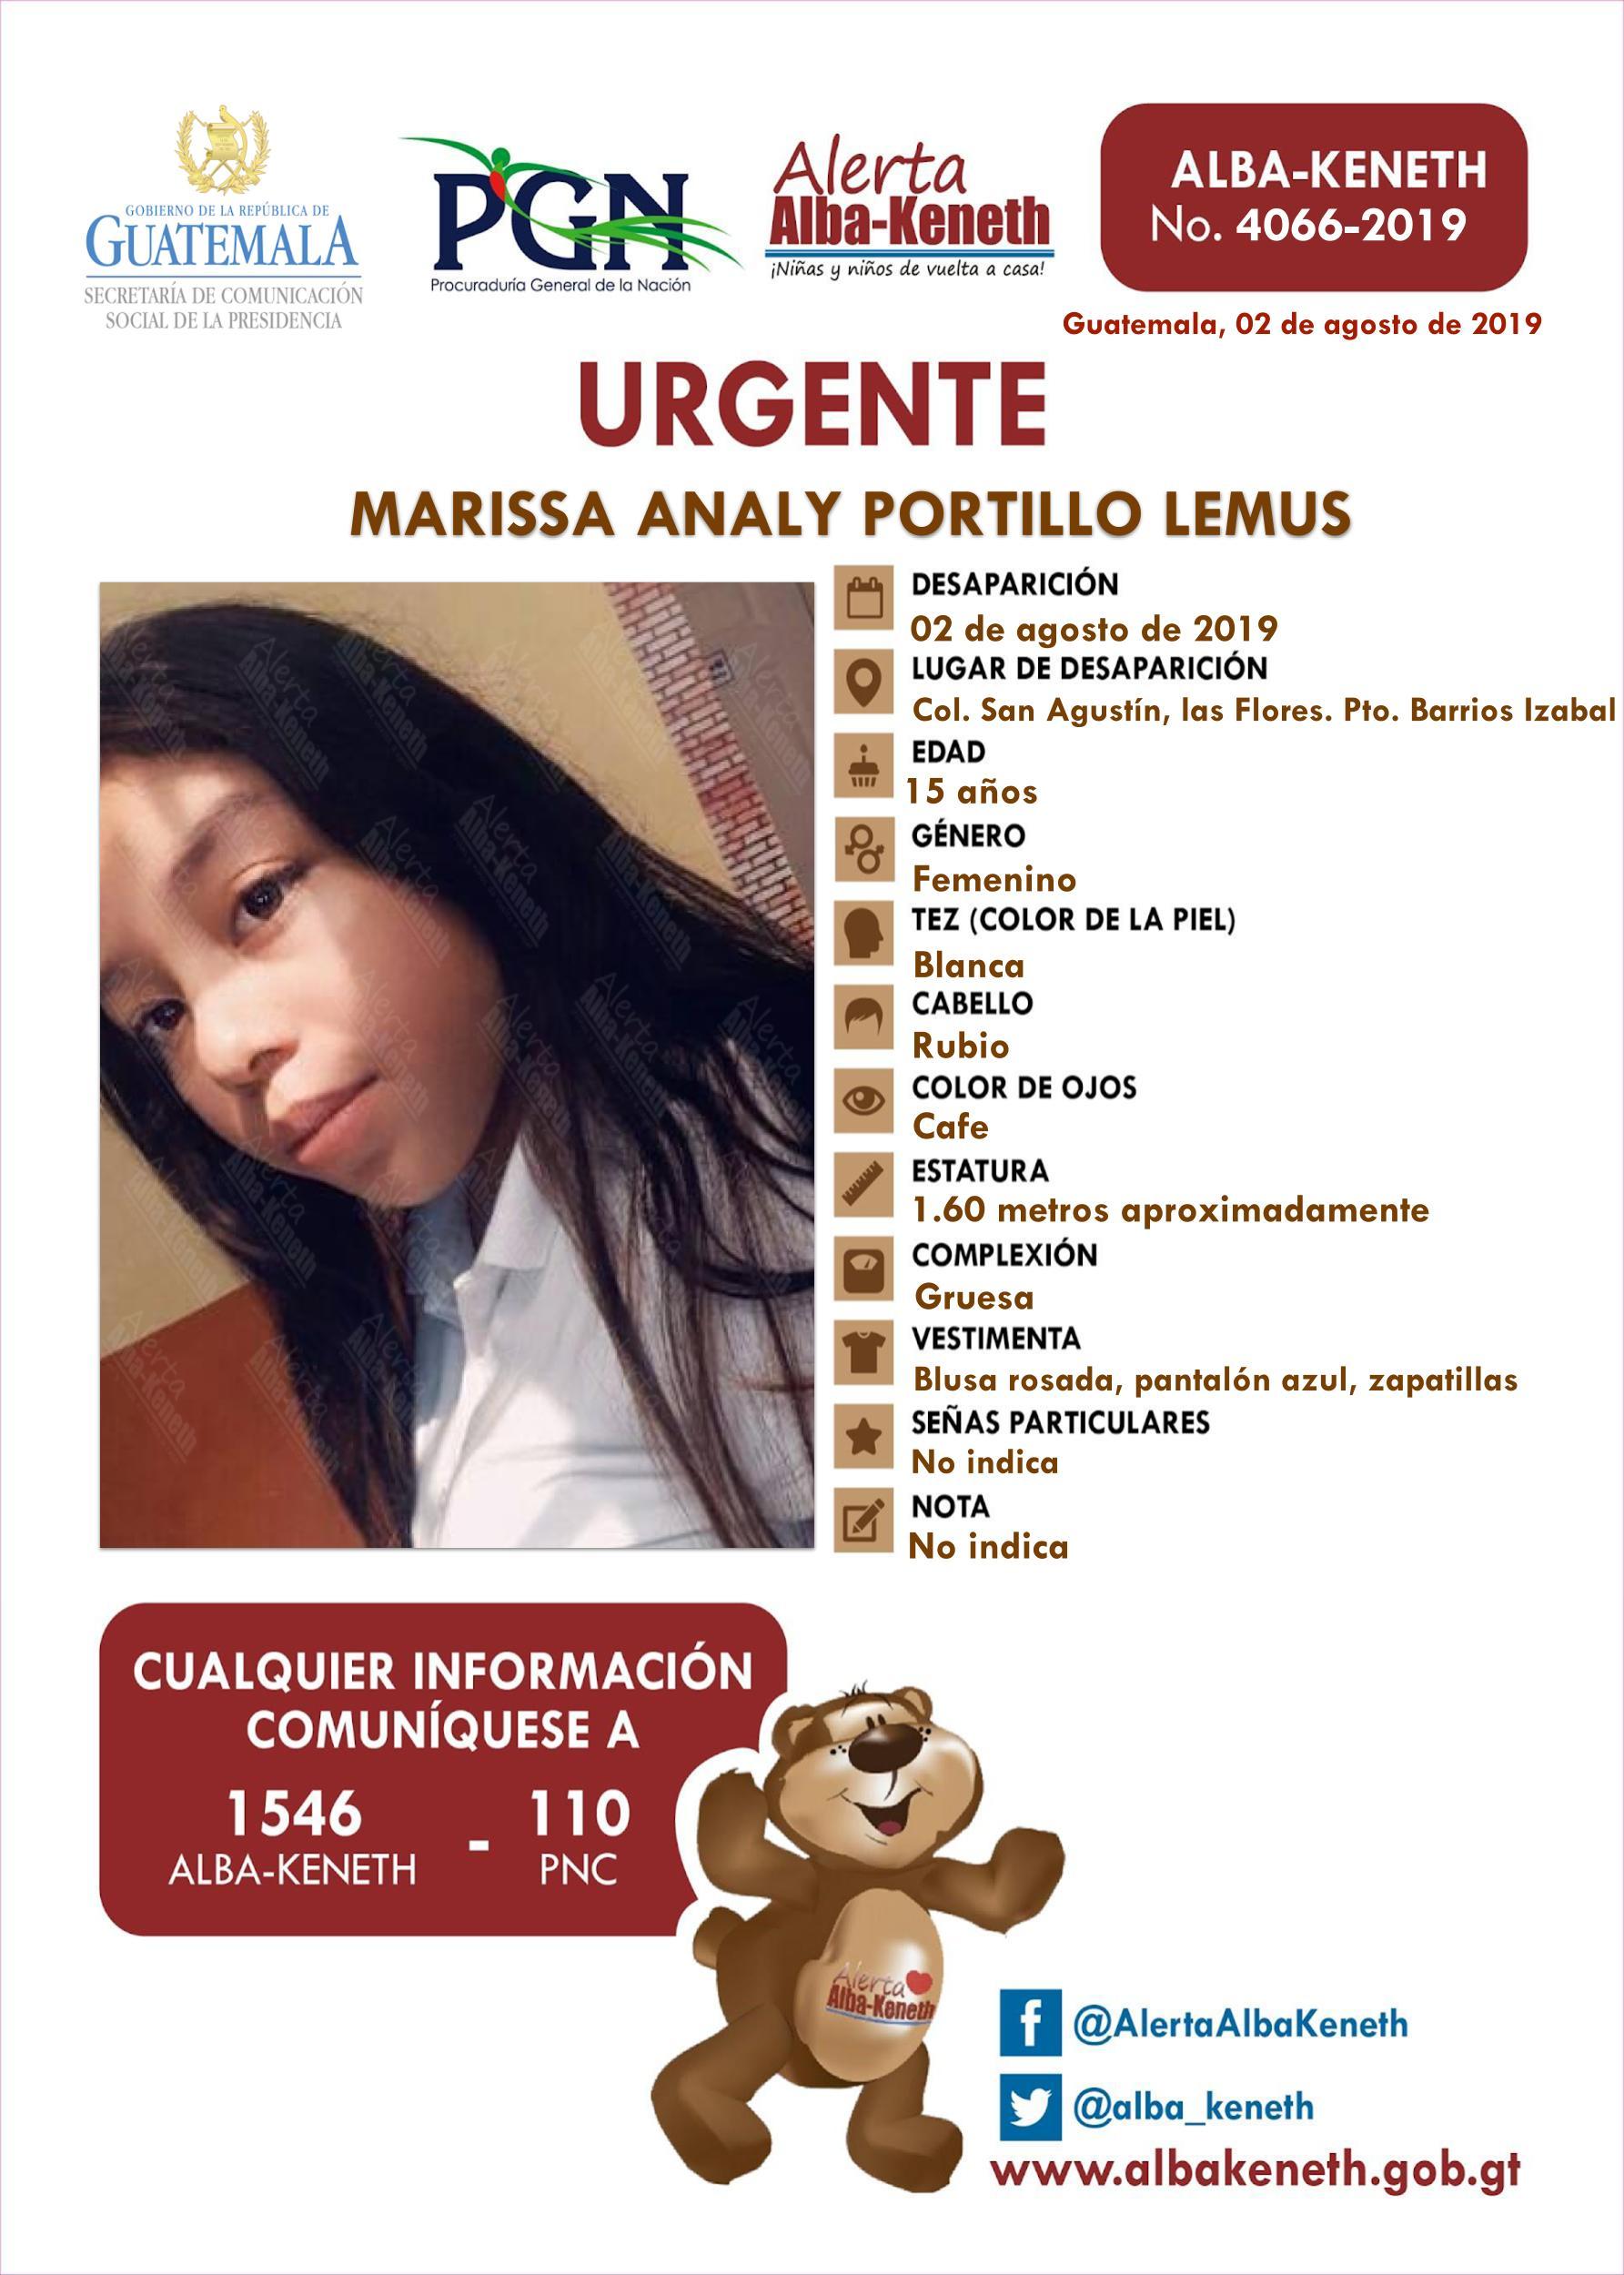 Marissa Analy Portillo Lemus